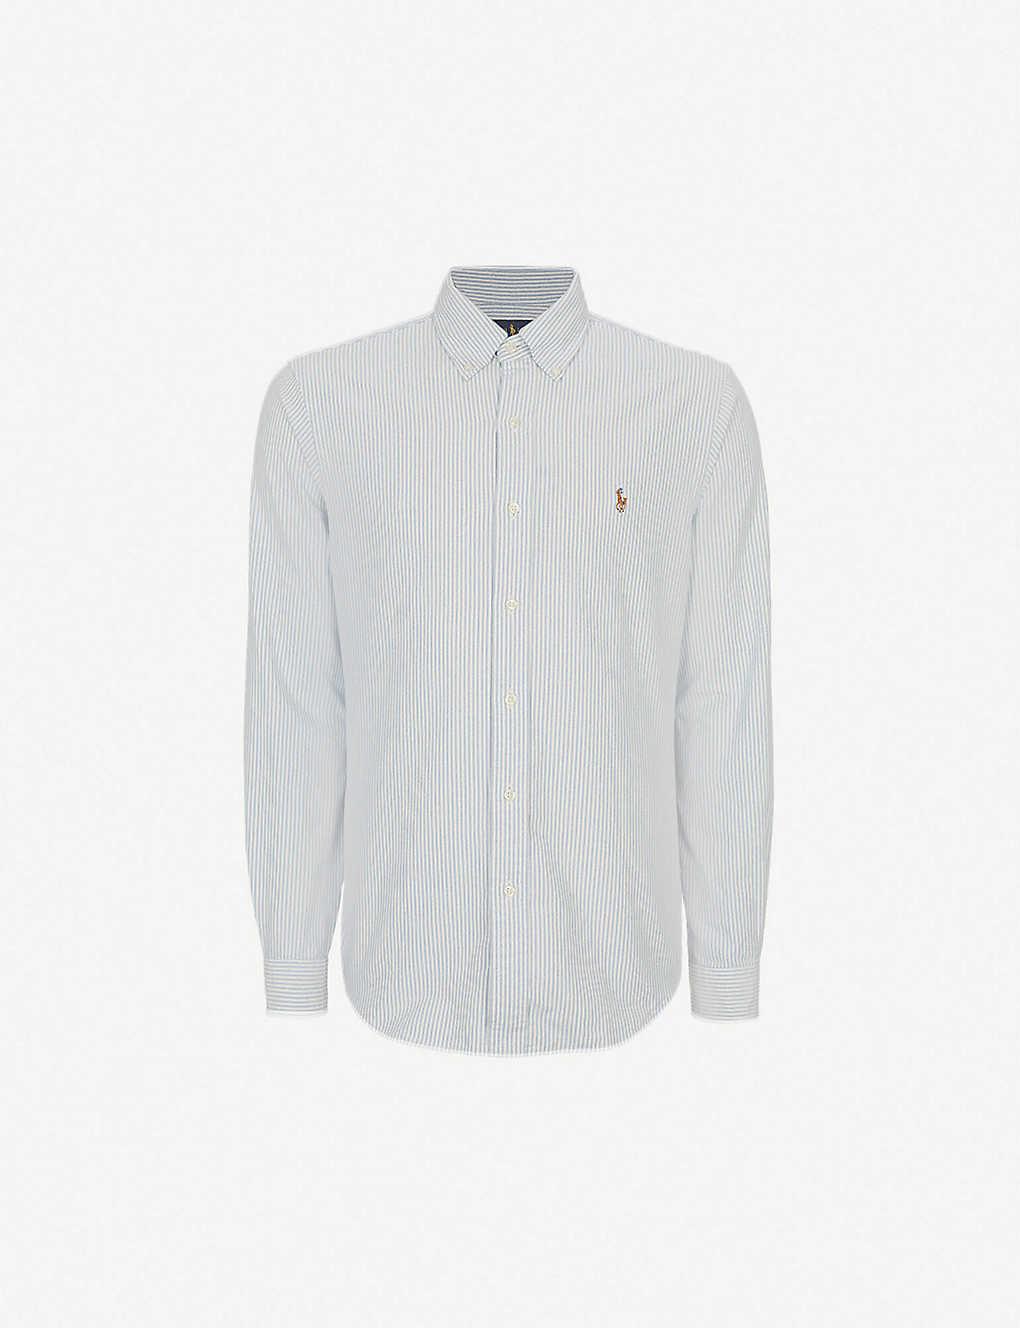 e5c2fa12 Striped Oxford fit single cuff shirt - Bsr bluewhite stripe ...